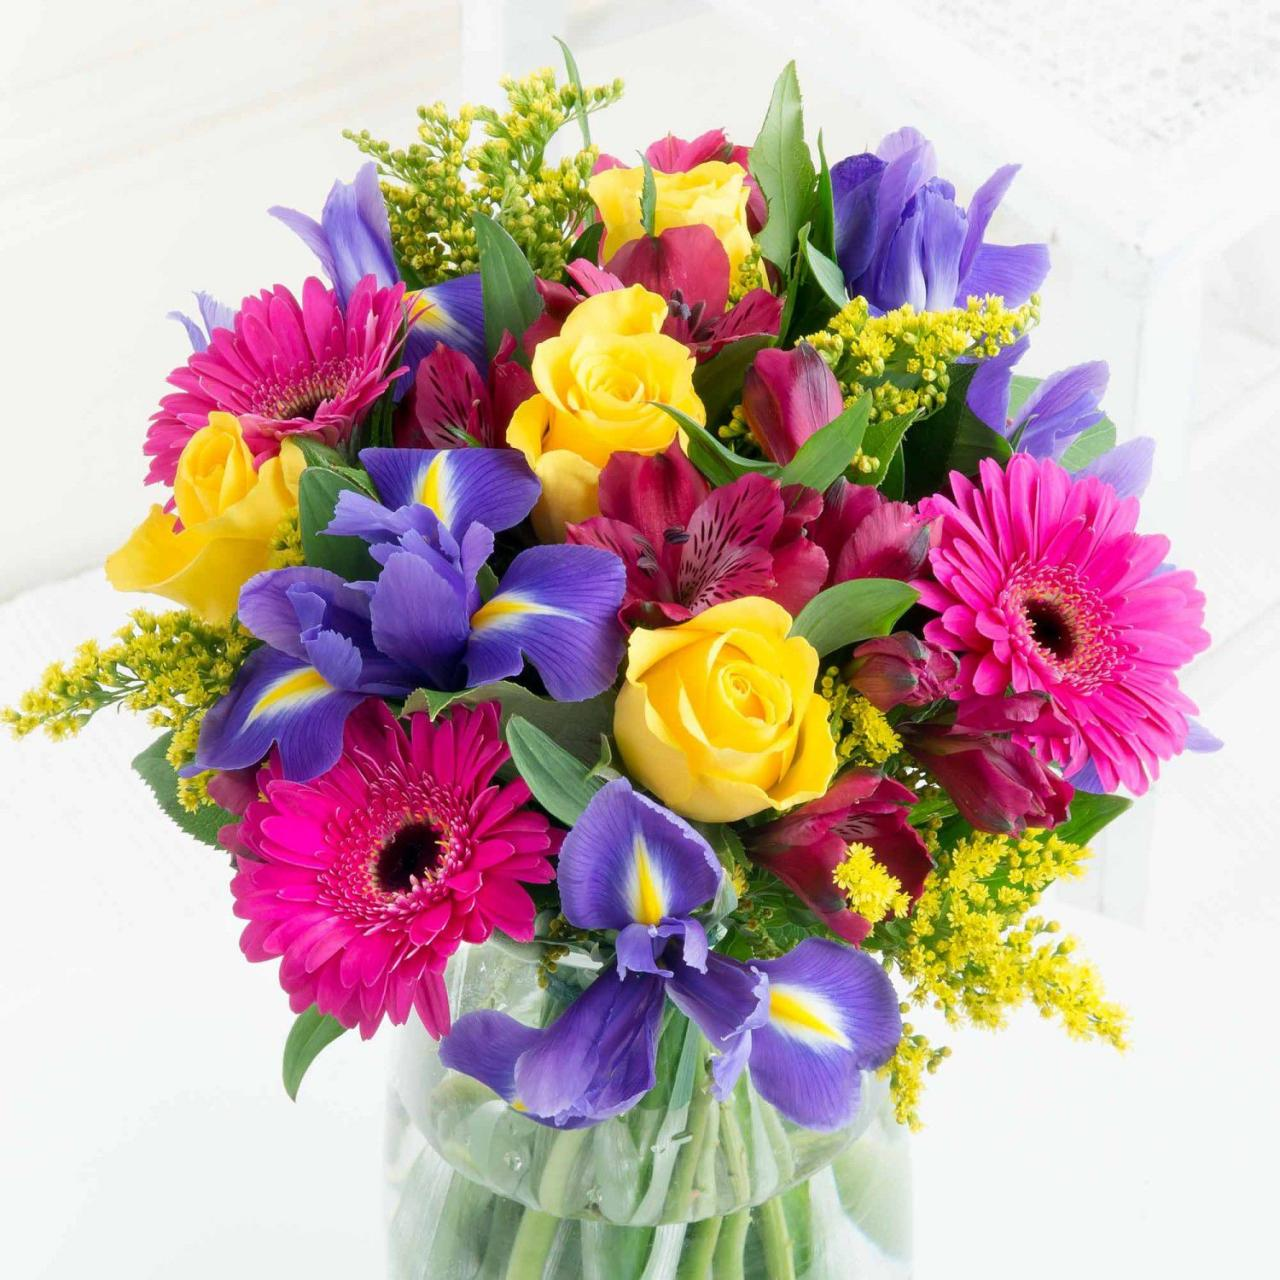 صورة صور اجمل ورد , اجمل انواع الورود بالصور